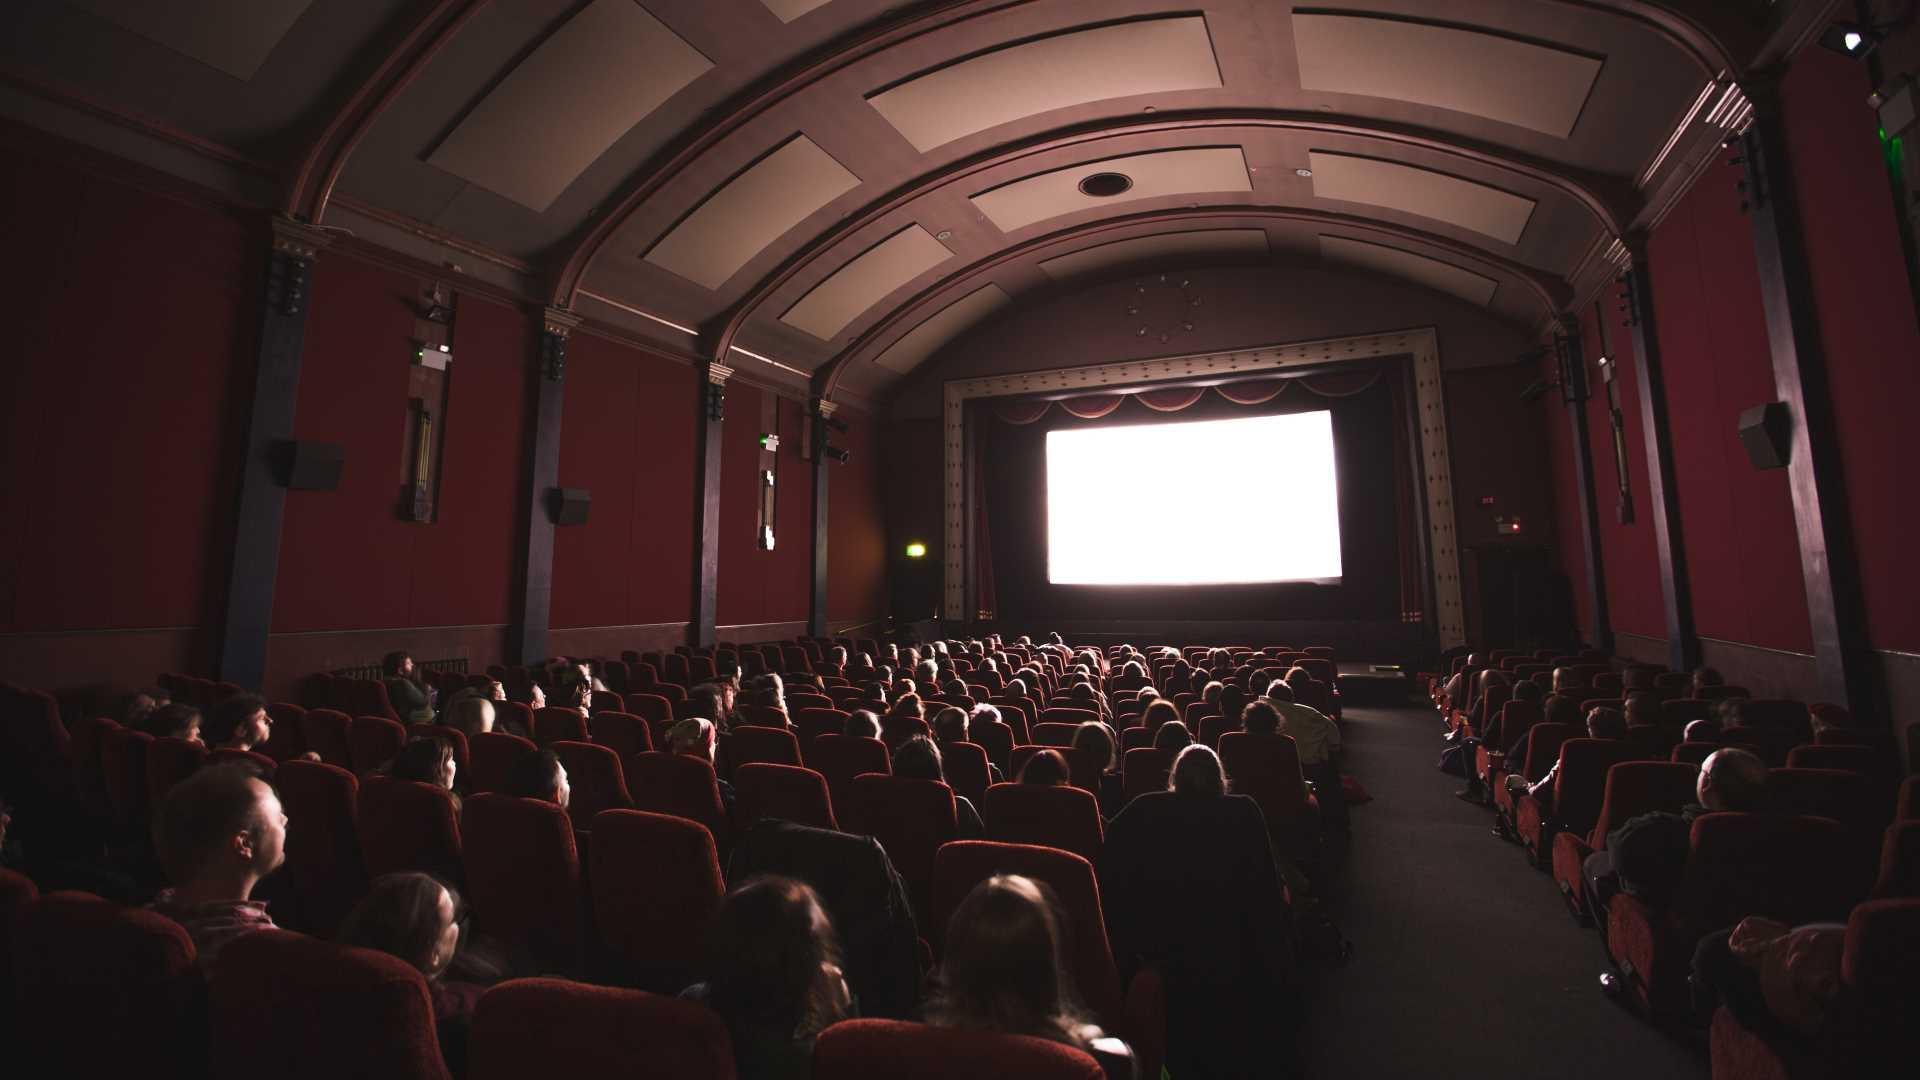 Making Movies That Glorify God